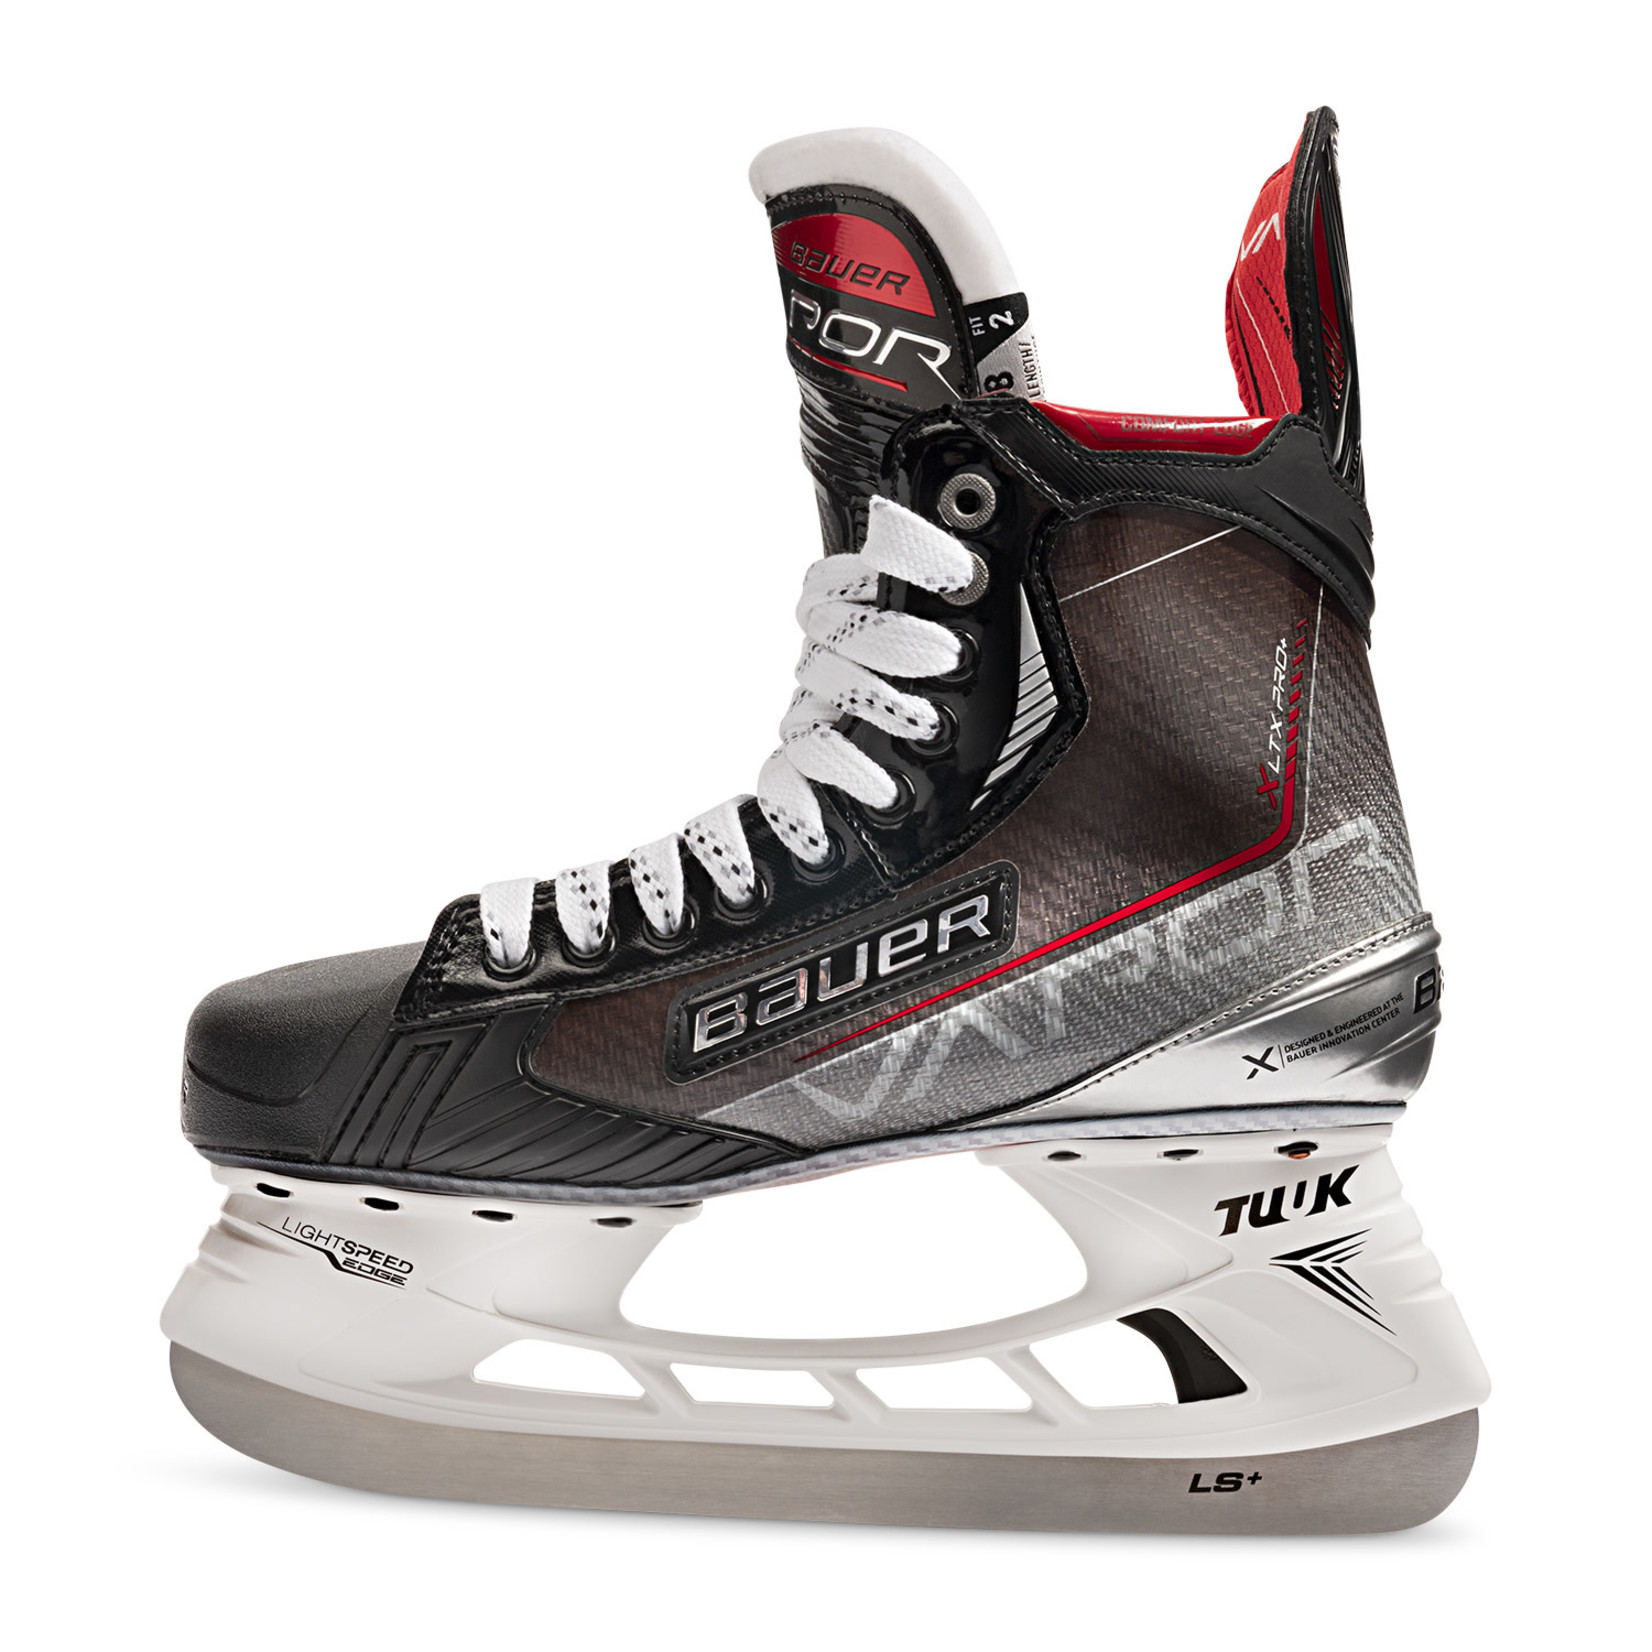 Bauer Bauer Hockey Skates, Vapor XLTX Pro+, Senior